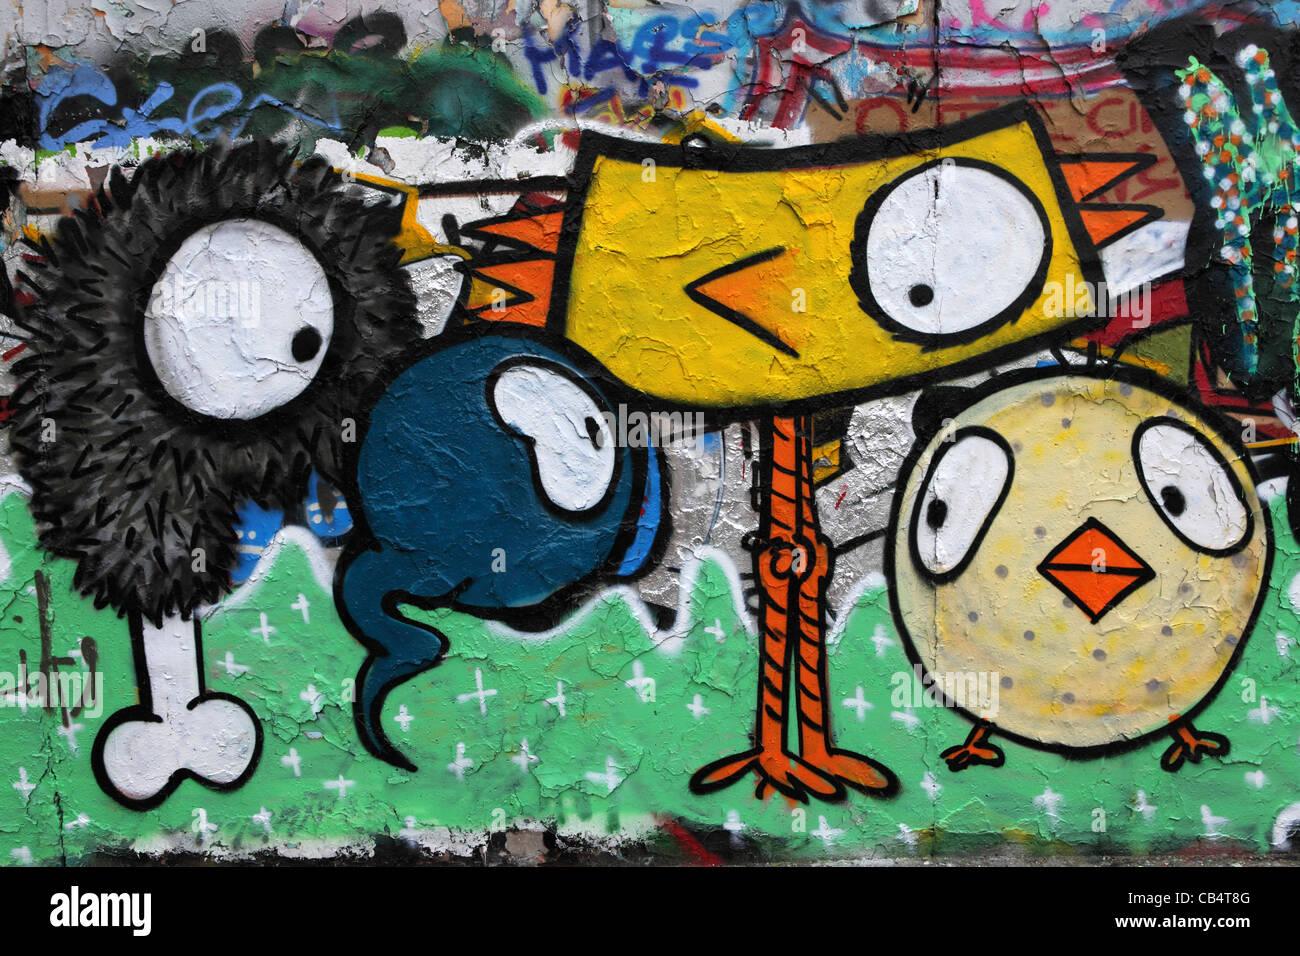 Grafiti wall berlin - Cartoon Like Graffiti On A Remnant Of The Berlin Wall At The Mauerpark Wall